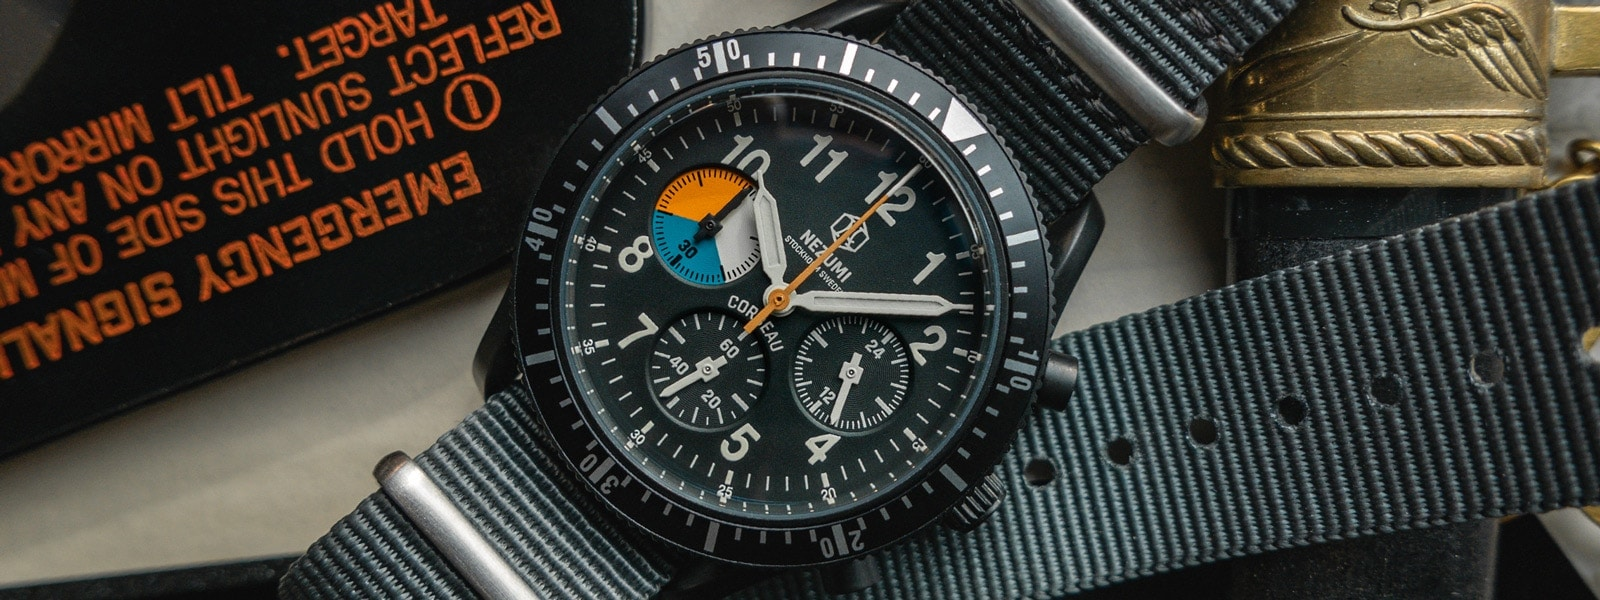 Nezumi Studios Watch Corbeau CQ2.333 military chronograph with nato strap